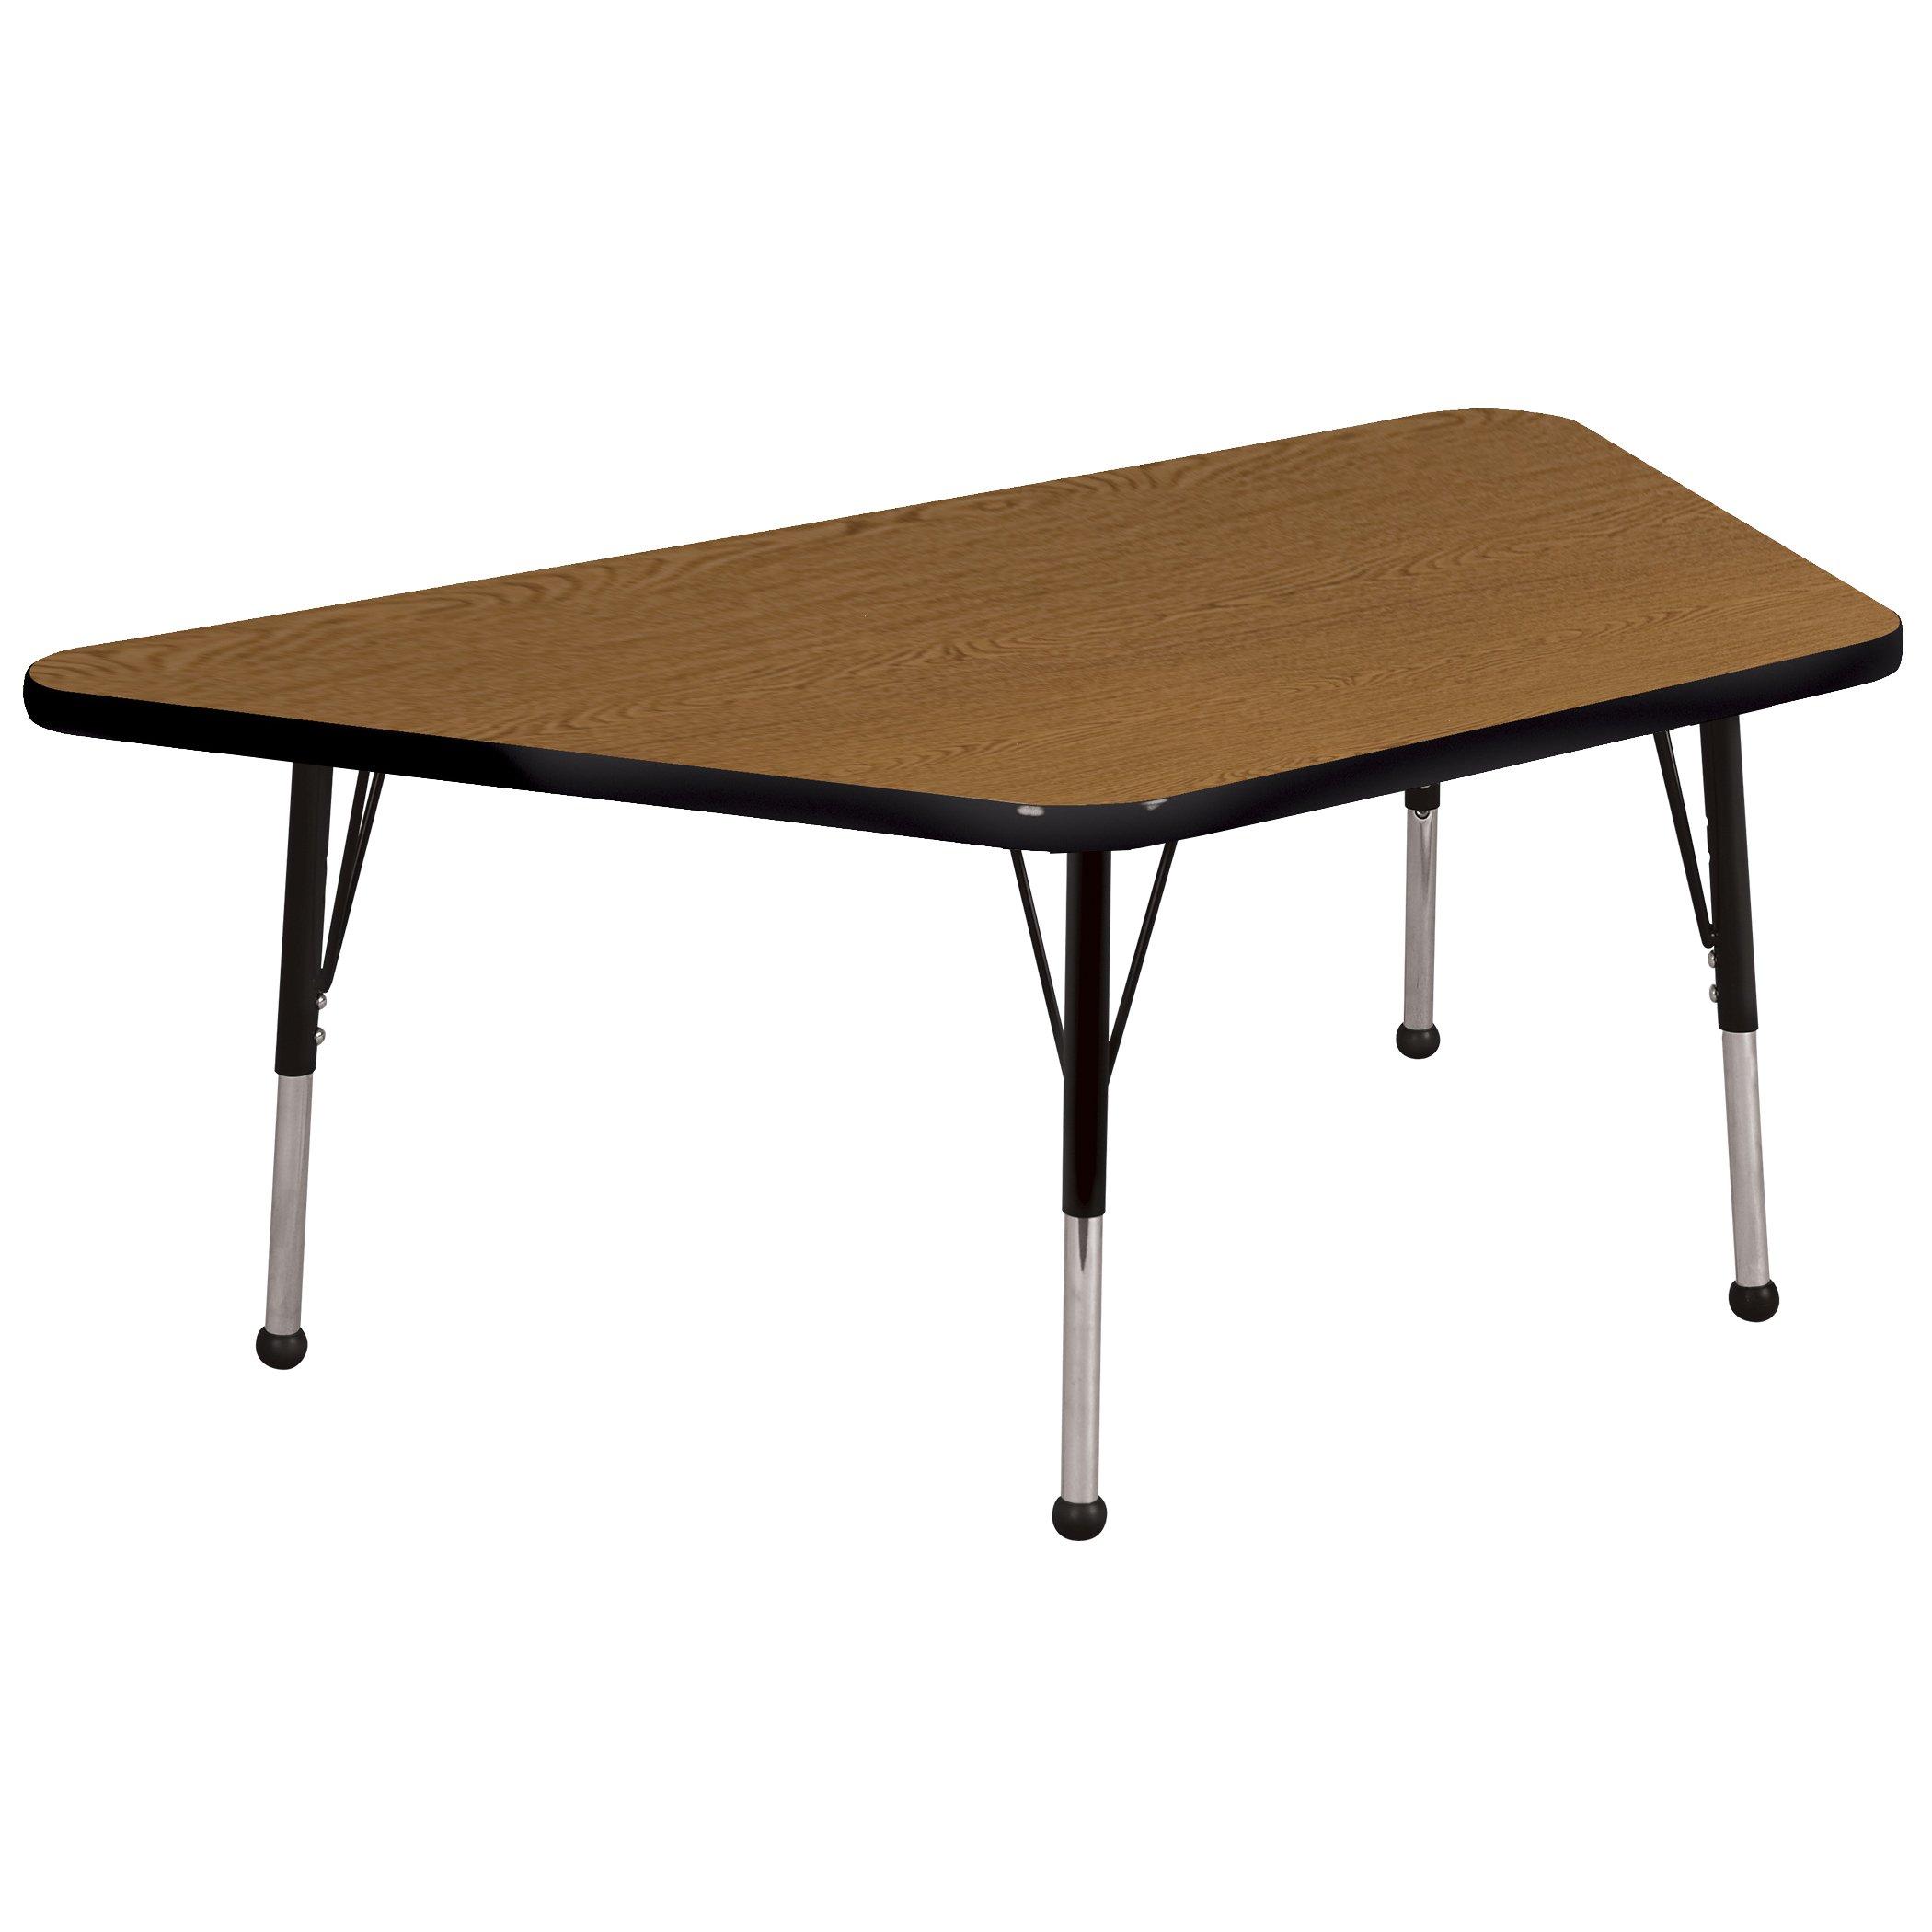 ECR4Kids Mesa Premium 30'' x 60'' Trapezoid School Activity Table, Toddler Legs w/Ball Glides, Adjustable Height 15-23 inch (Oak/Black) by ECR4Kids